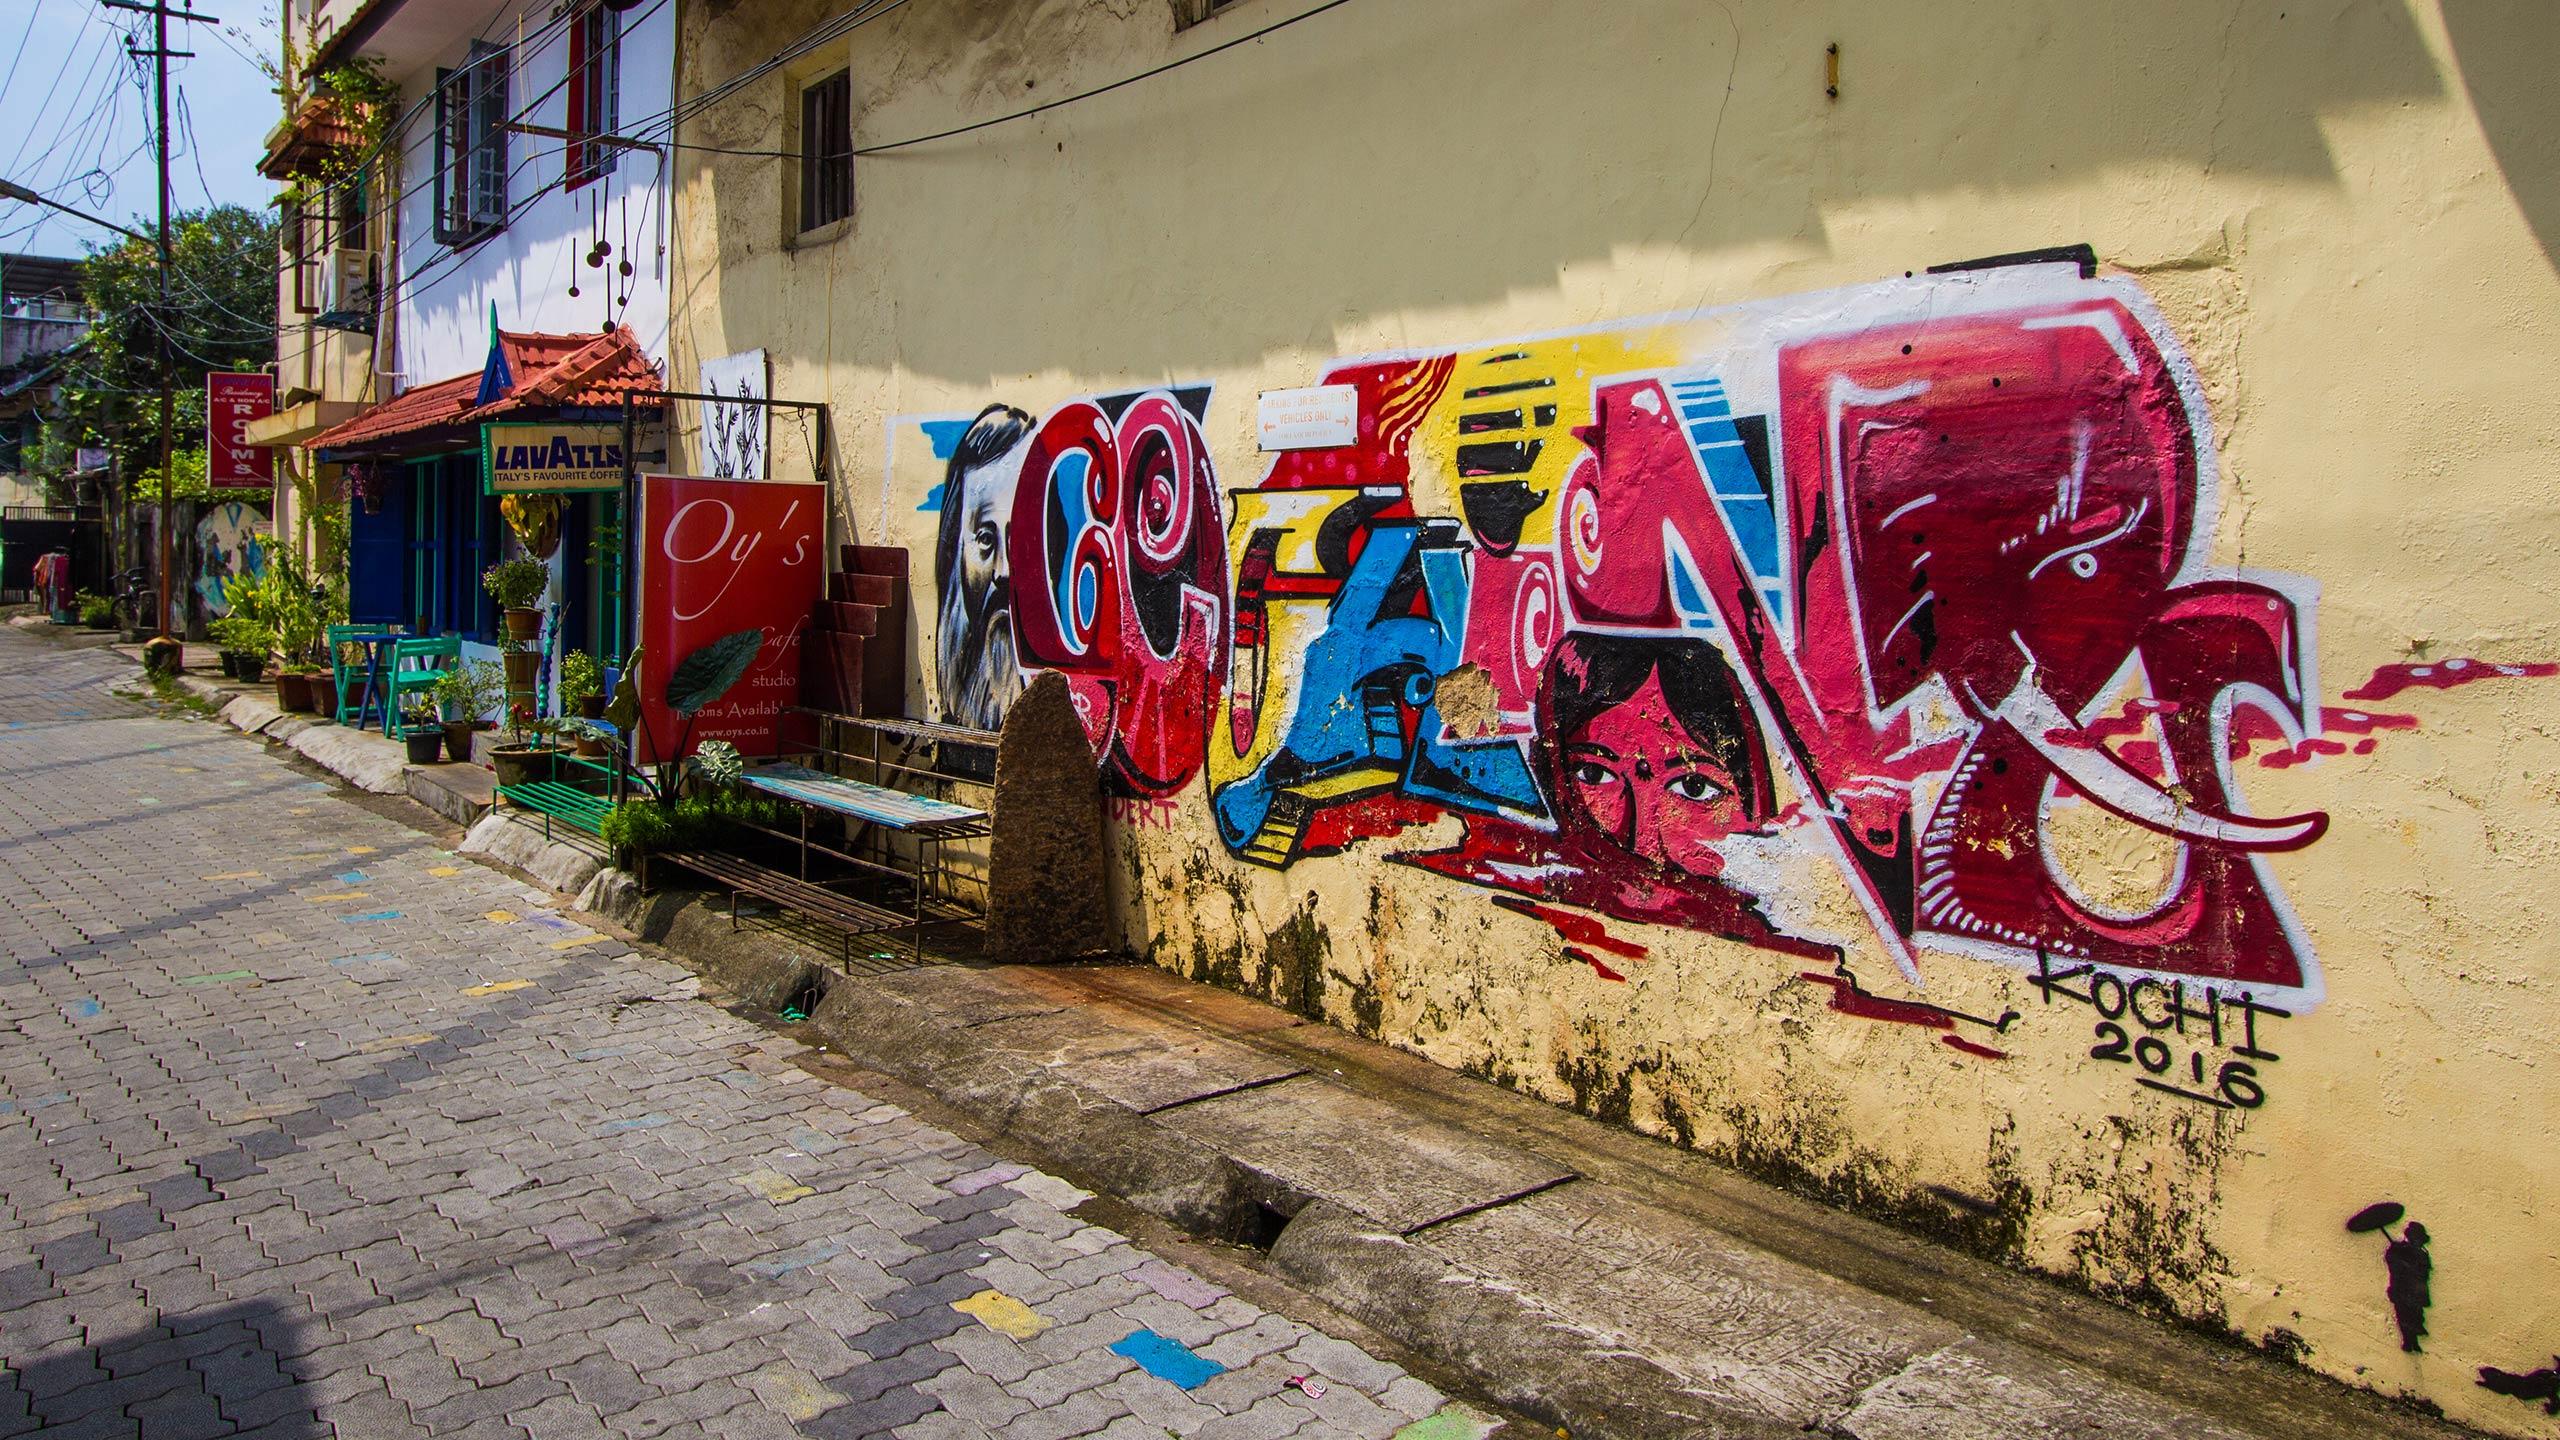 Street art on Berger Street, Fort Kochi, Kerala, India